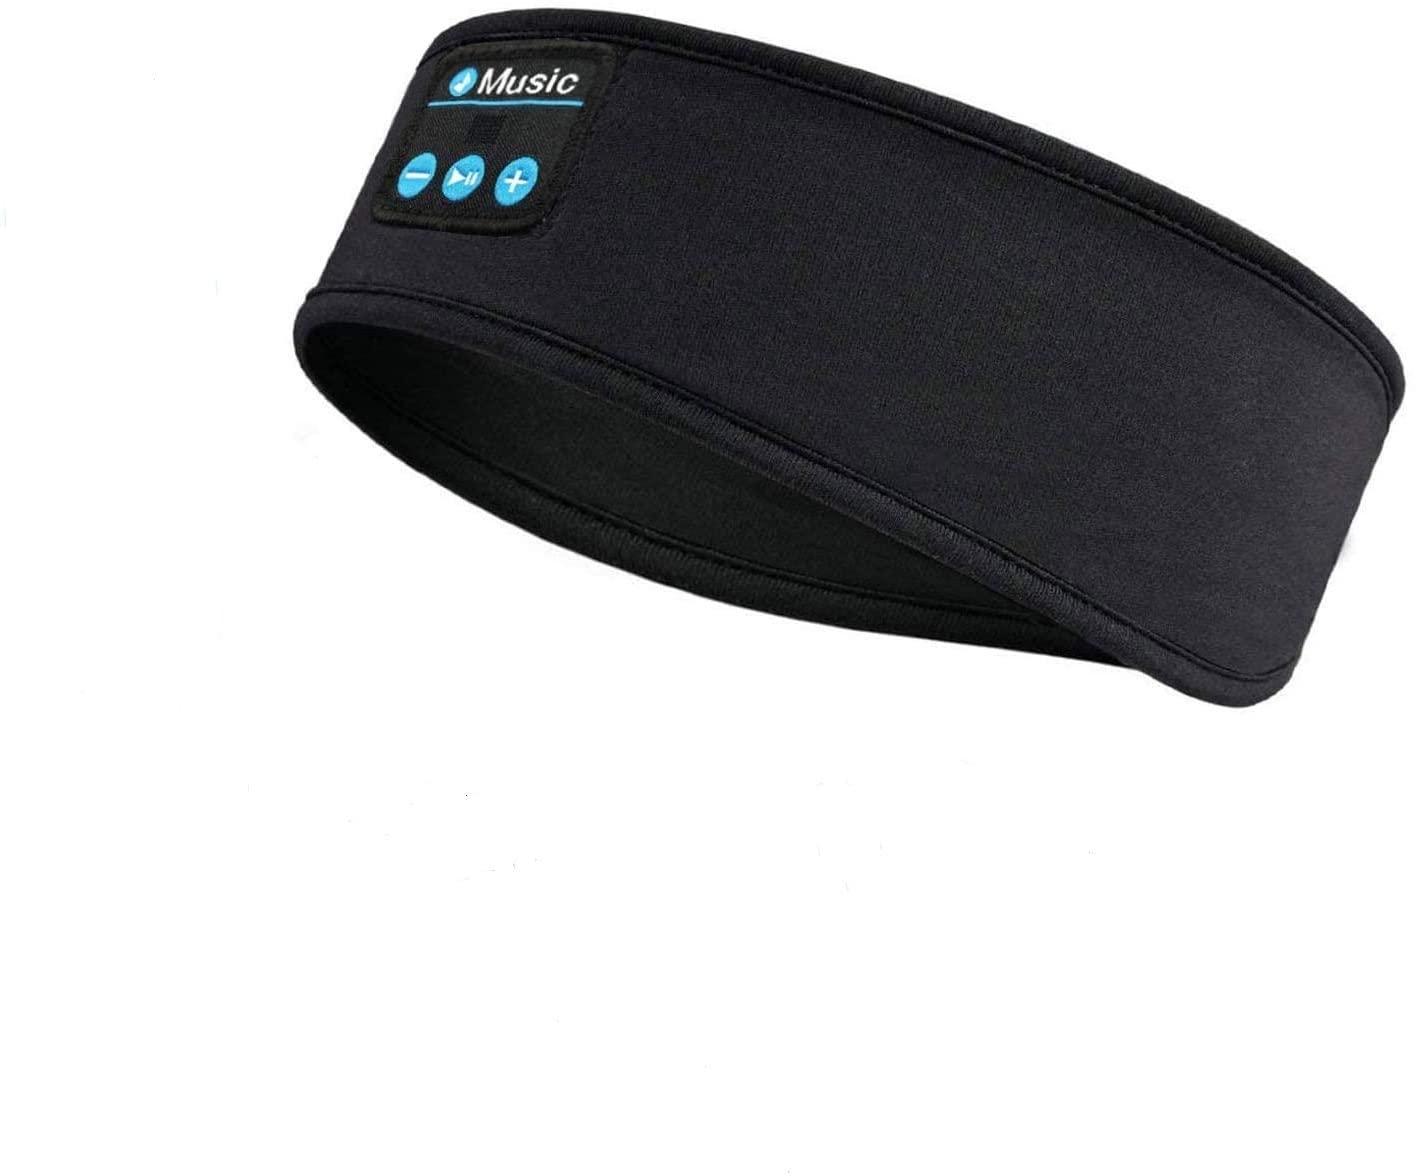 Sleep Headphones Bluetooth Headbands, Wireless Music Sports Headband Headphone - Soft Sleeping Headsets with Ultra -Thin Speakers for Side Sleeper, Workout, Running, Yoga